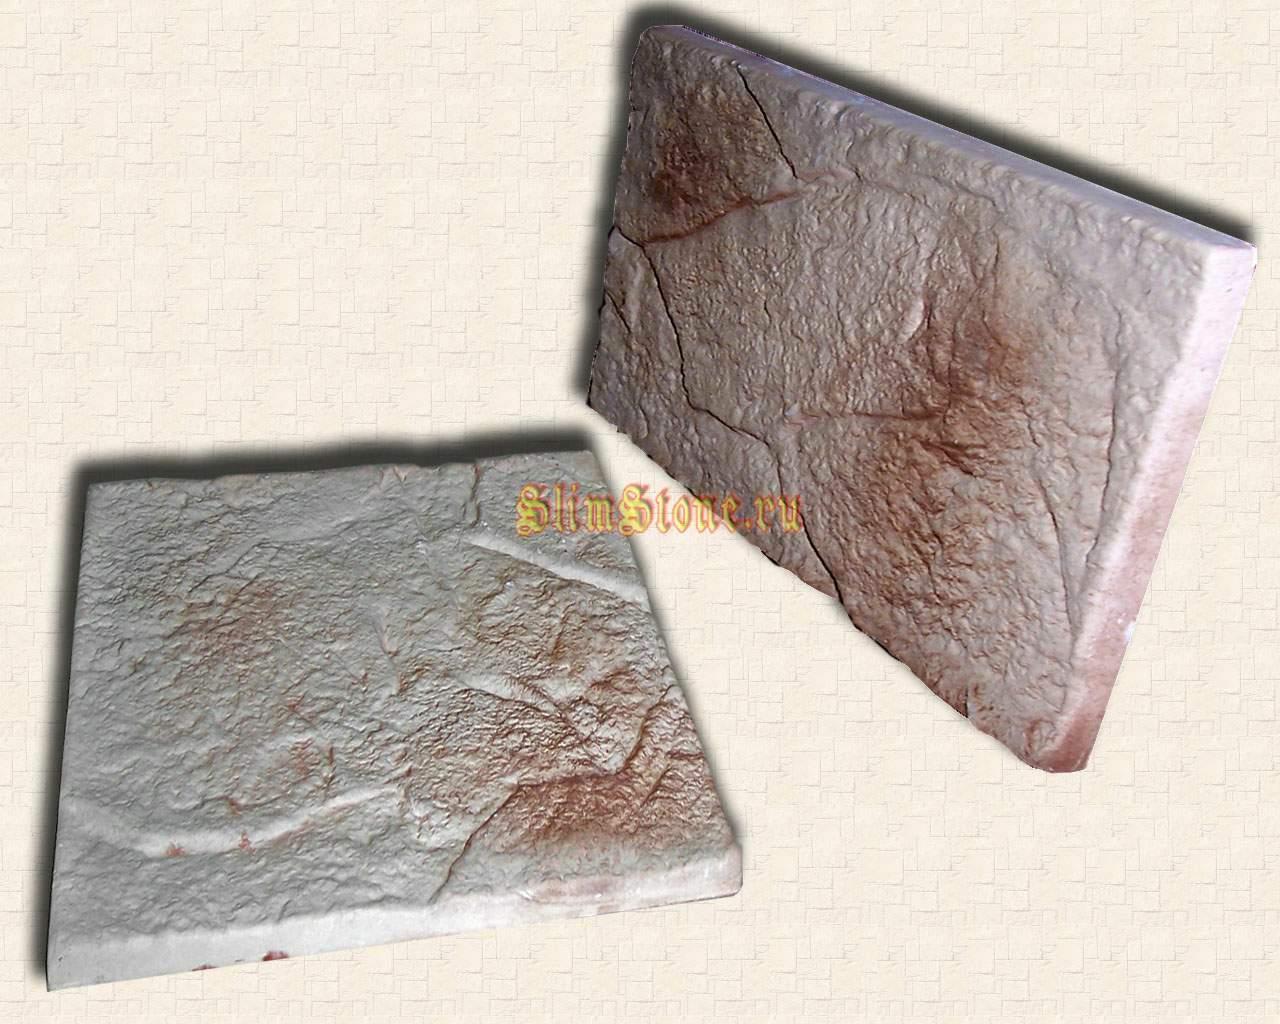 Плитки песчаник нажмите для загрузки